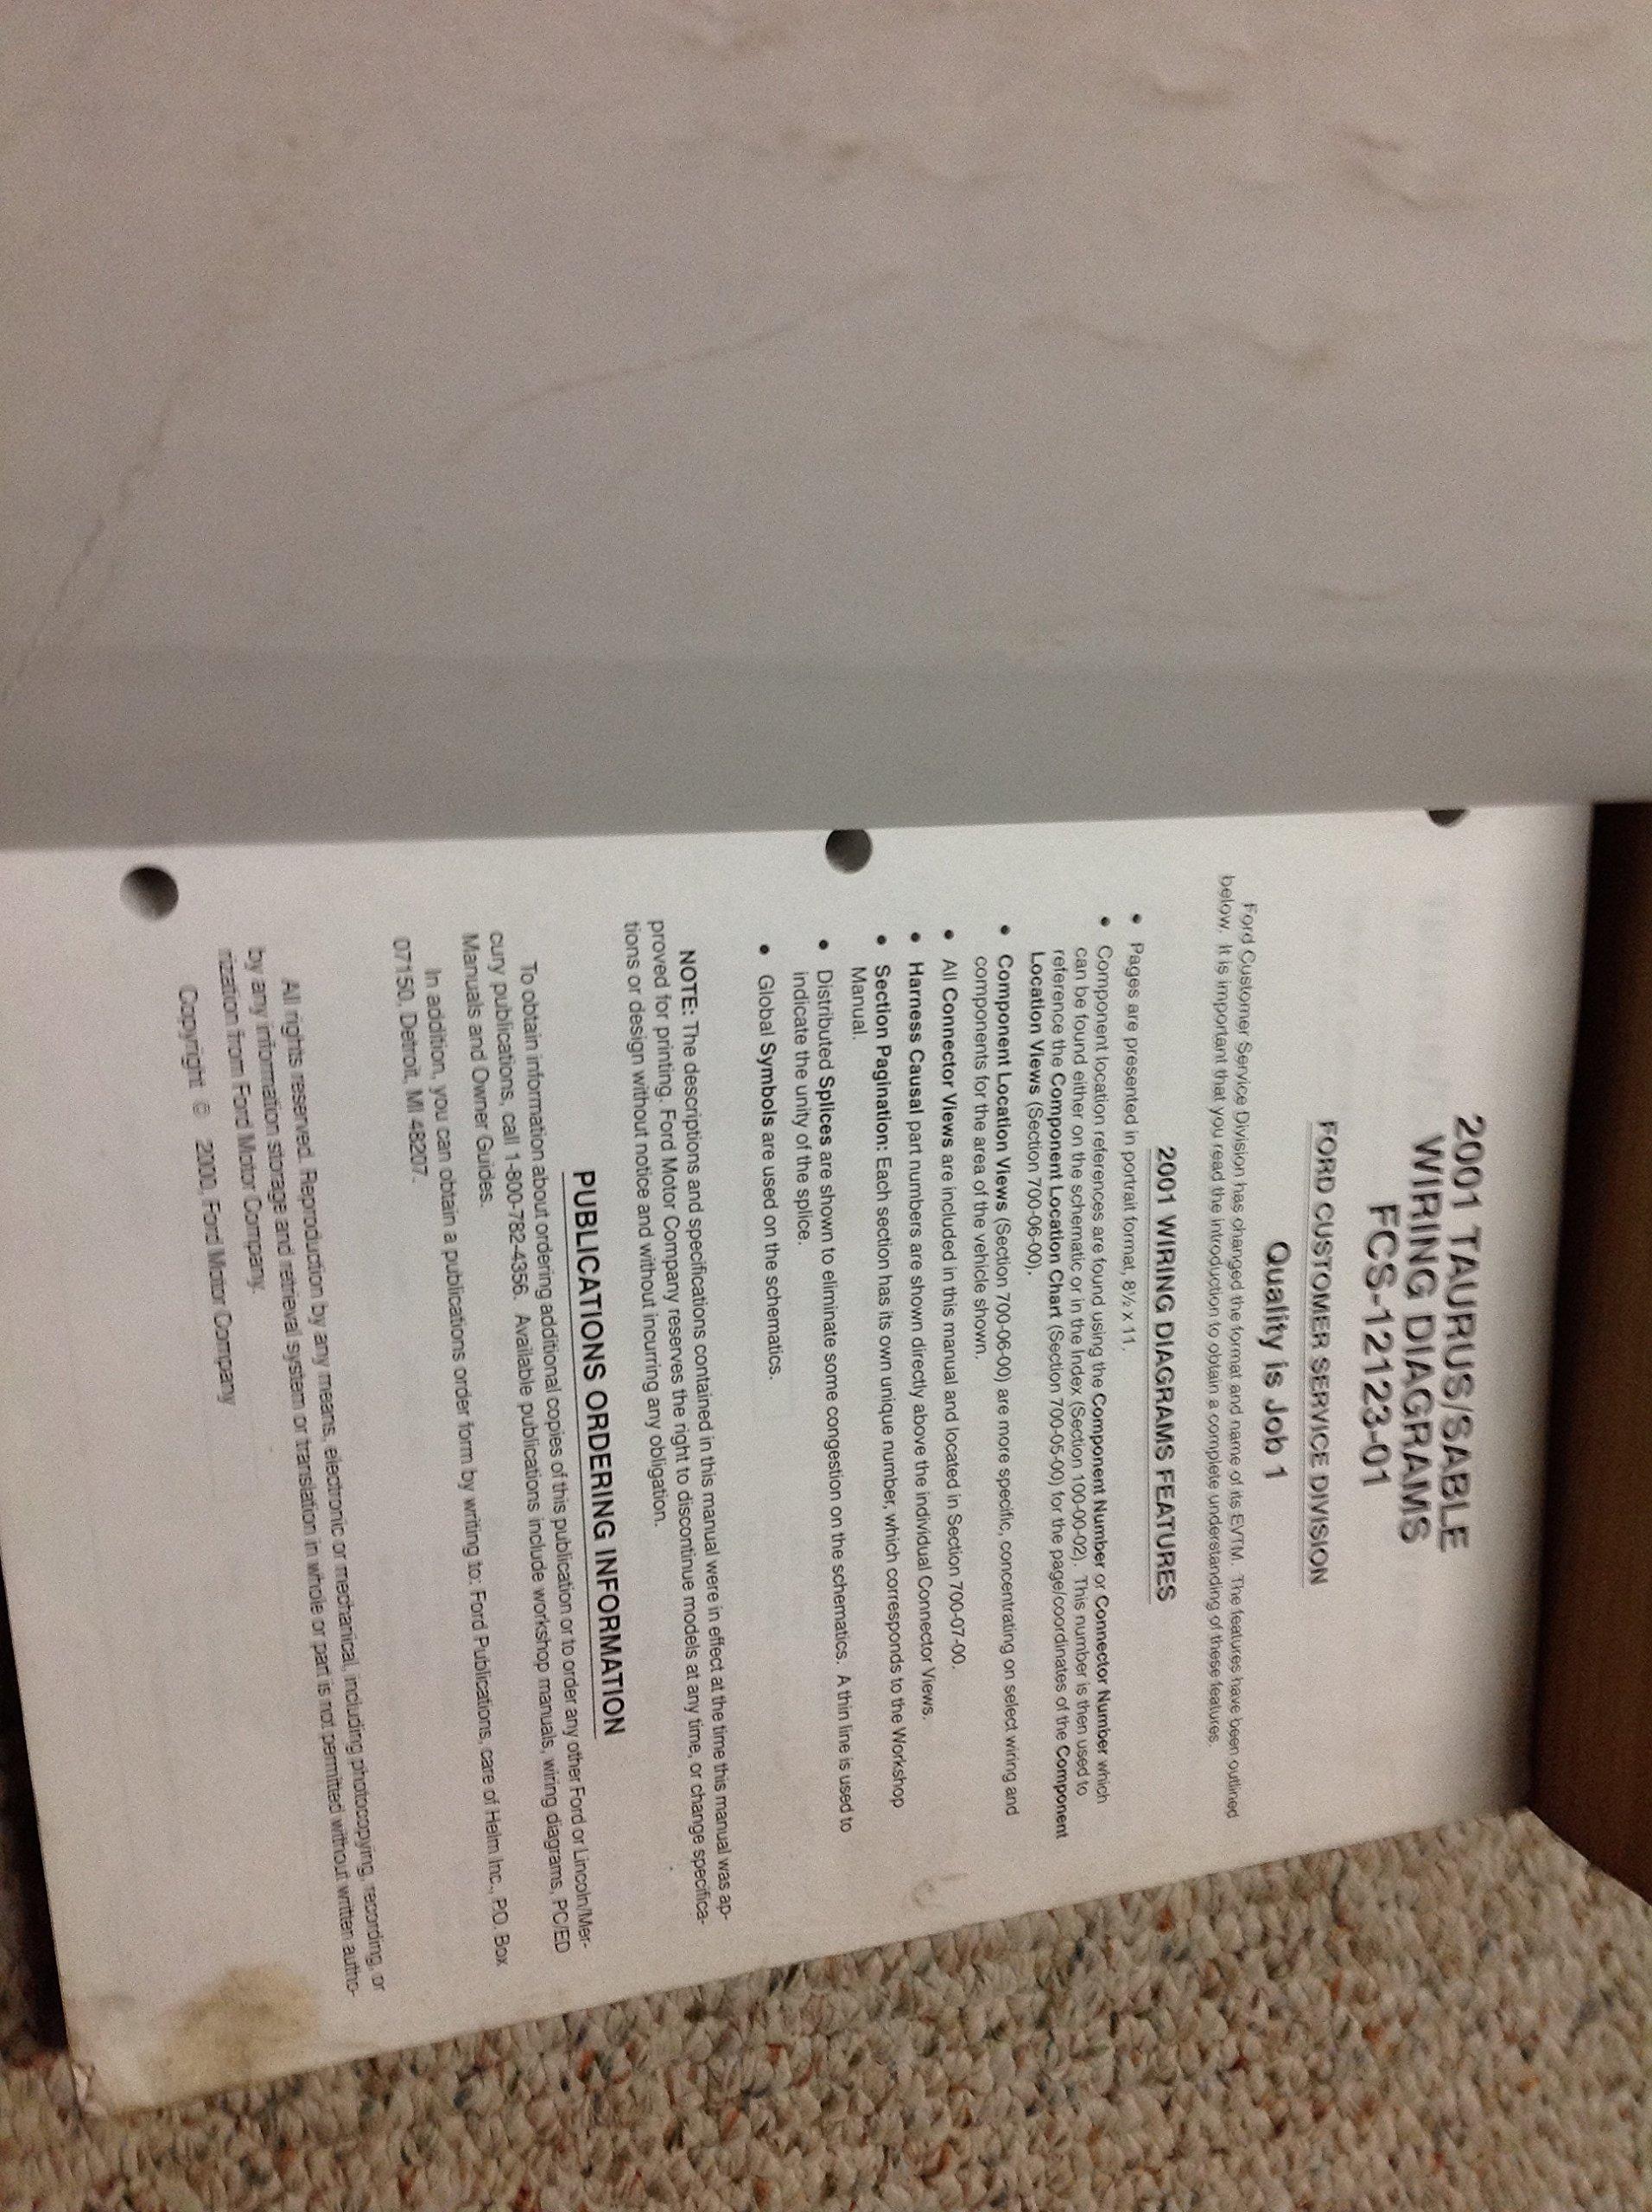 2001 FORD TAURUS MERCURY SABLE Service Shop Repair Manual Set W EWD +  Technical: FORD: Amazon.com: Books